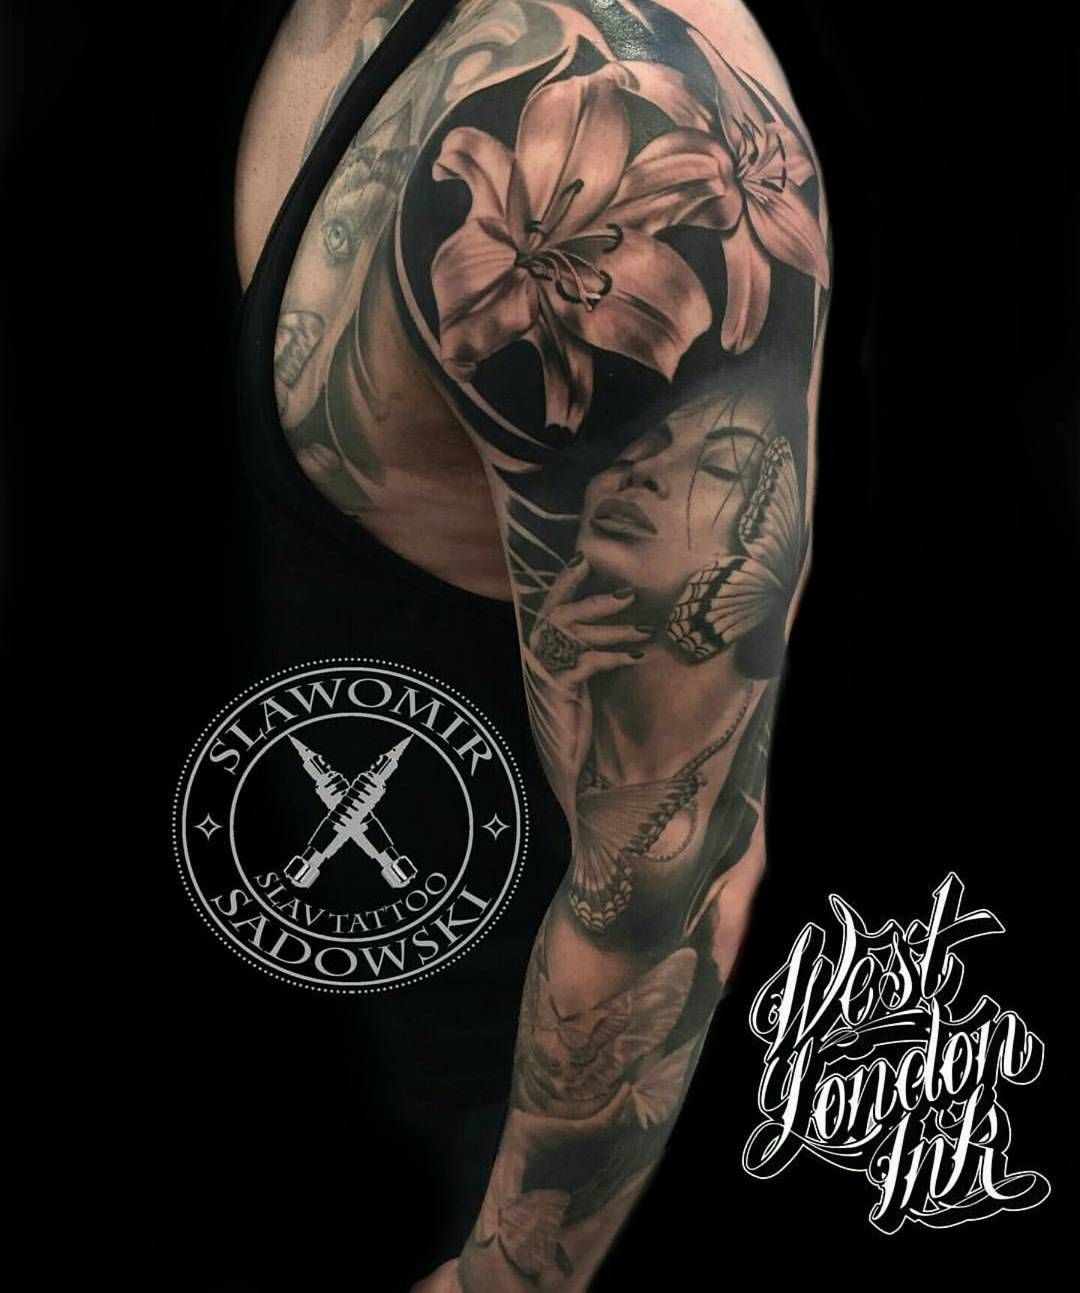 Slawomir Sadowski @slavtattoo London #tattwho #tattoo #tattoos #tattooartist #tattooartists #tattooist #tattooer #artist #tattoolife #instaart #instatattoo #tattoodesign #tattooed #ink #inked #tattooaddict #tattooart #art #photooftheday #instagood #instastyle #instabeauty #bodyart #tattooidea #tattoooftheday #sleeve #blackandgray #realism #london #tattooedgirls